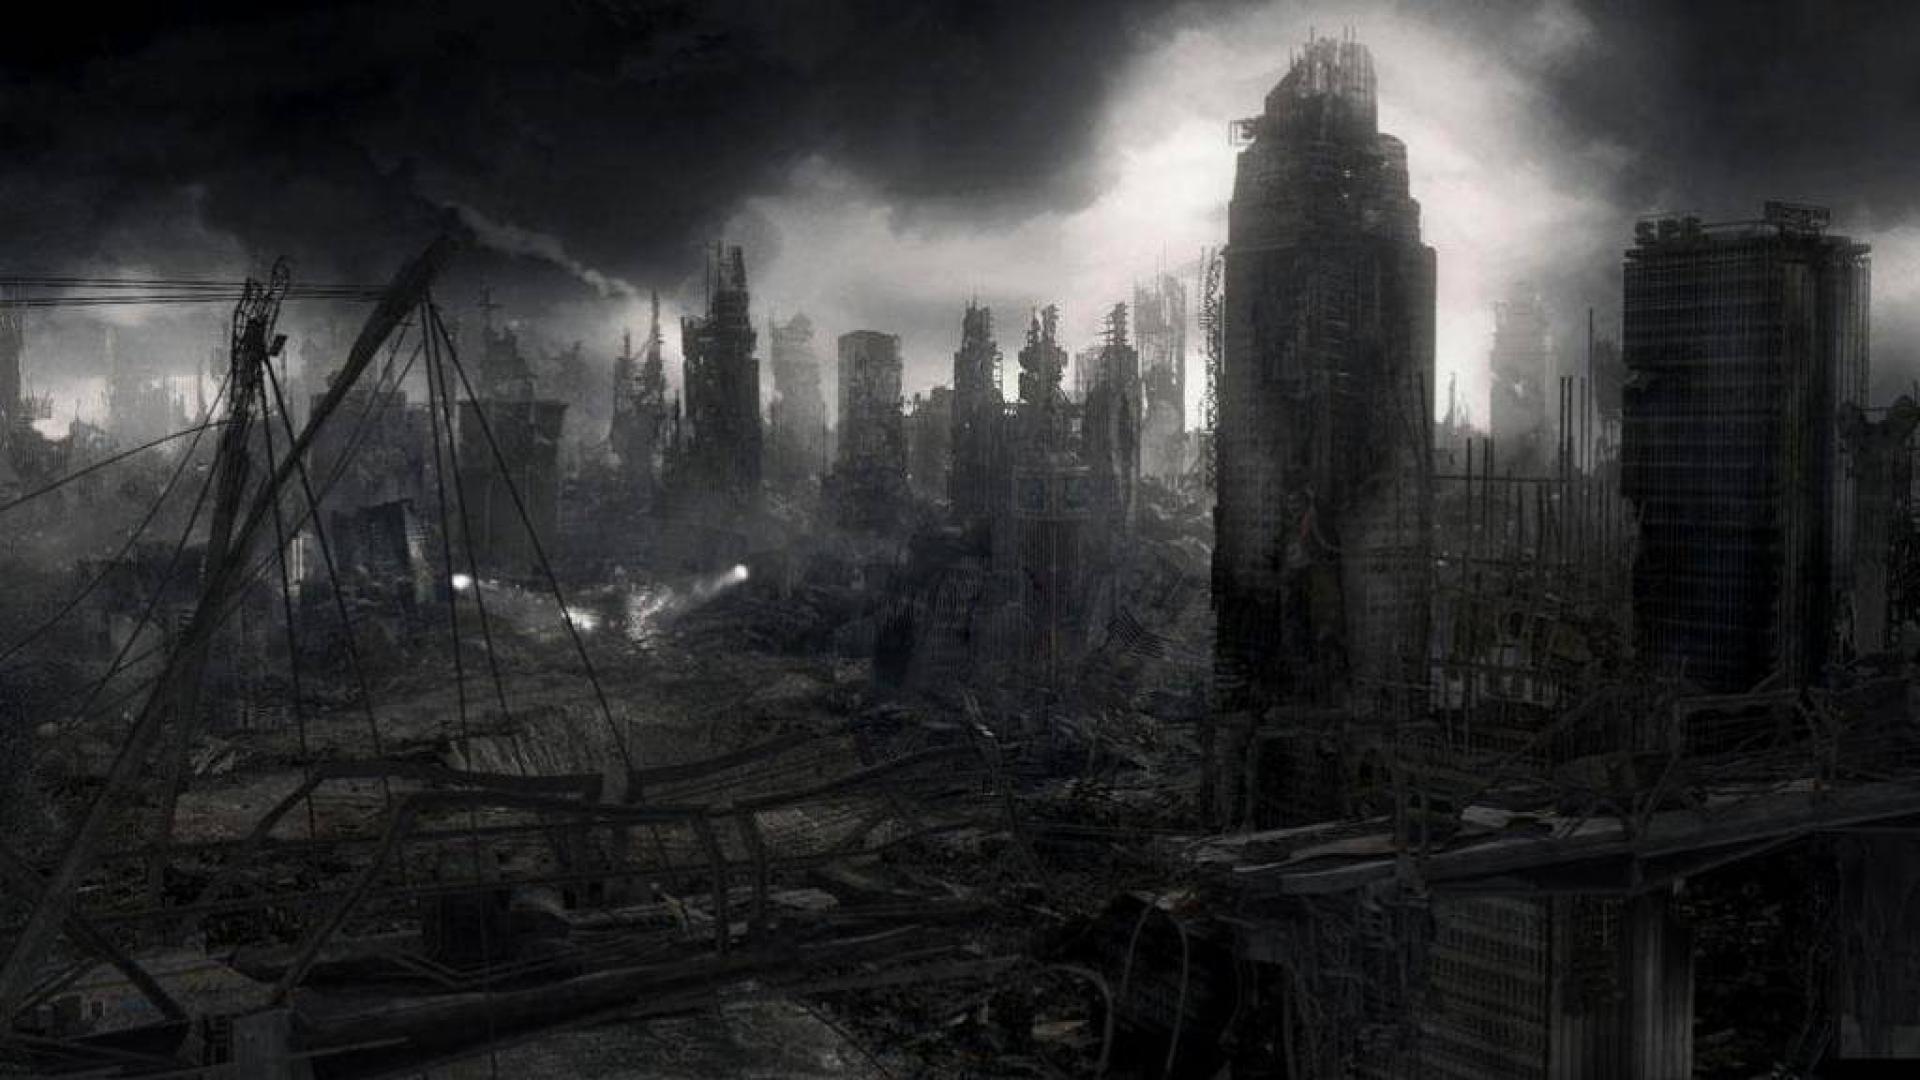 Zombie Apocalypse Wallpaper – WallpaperSafari